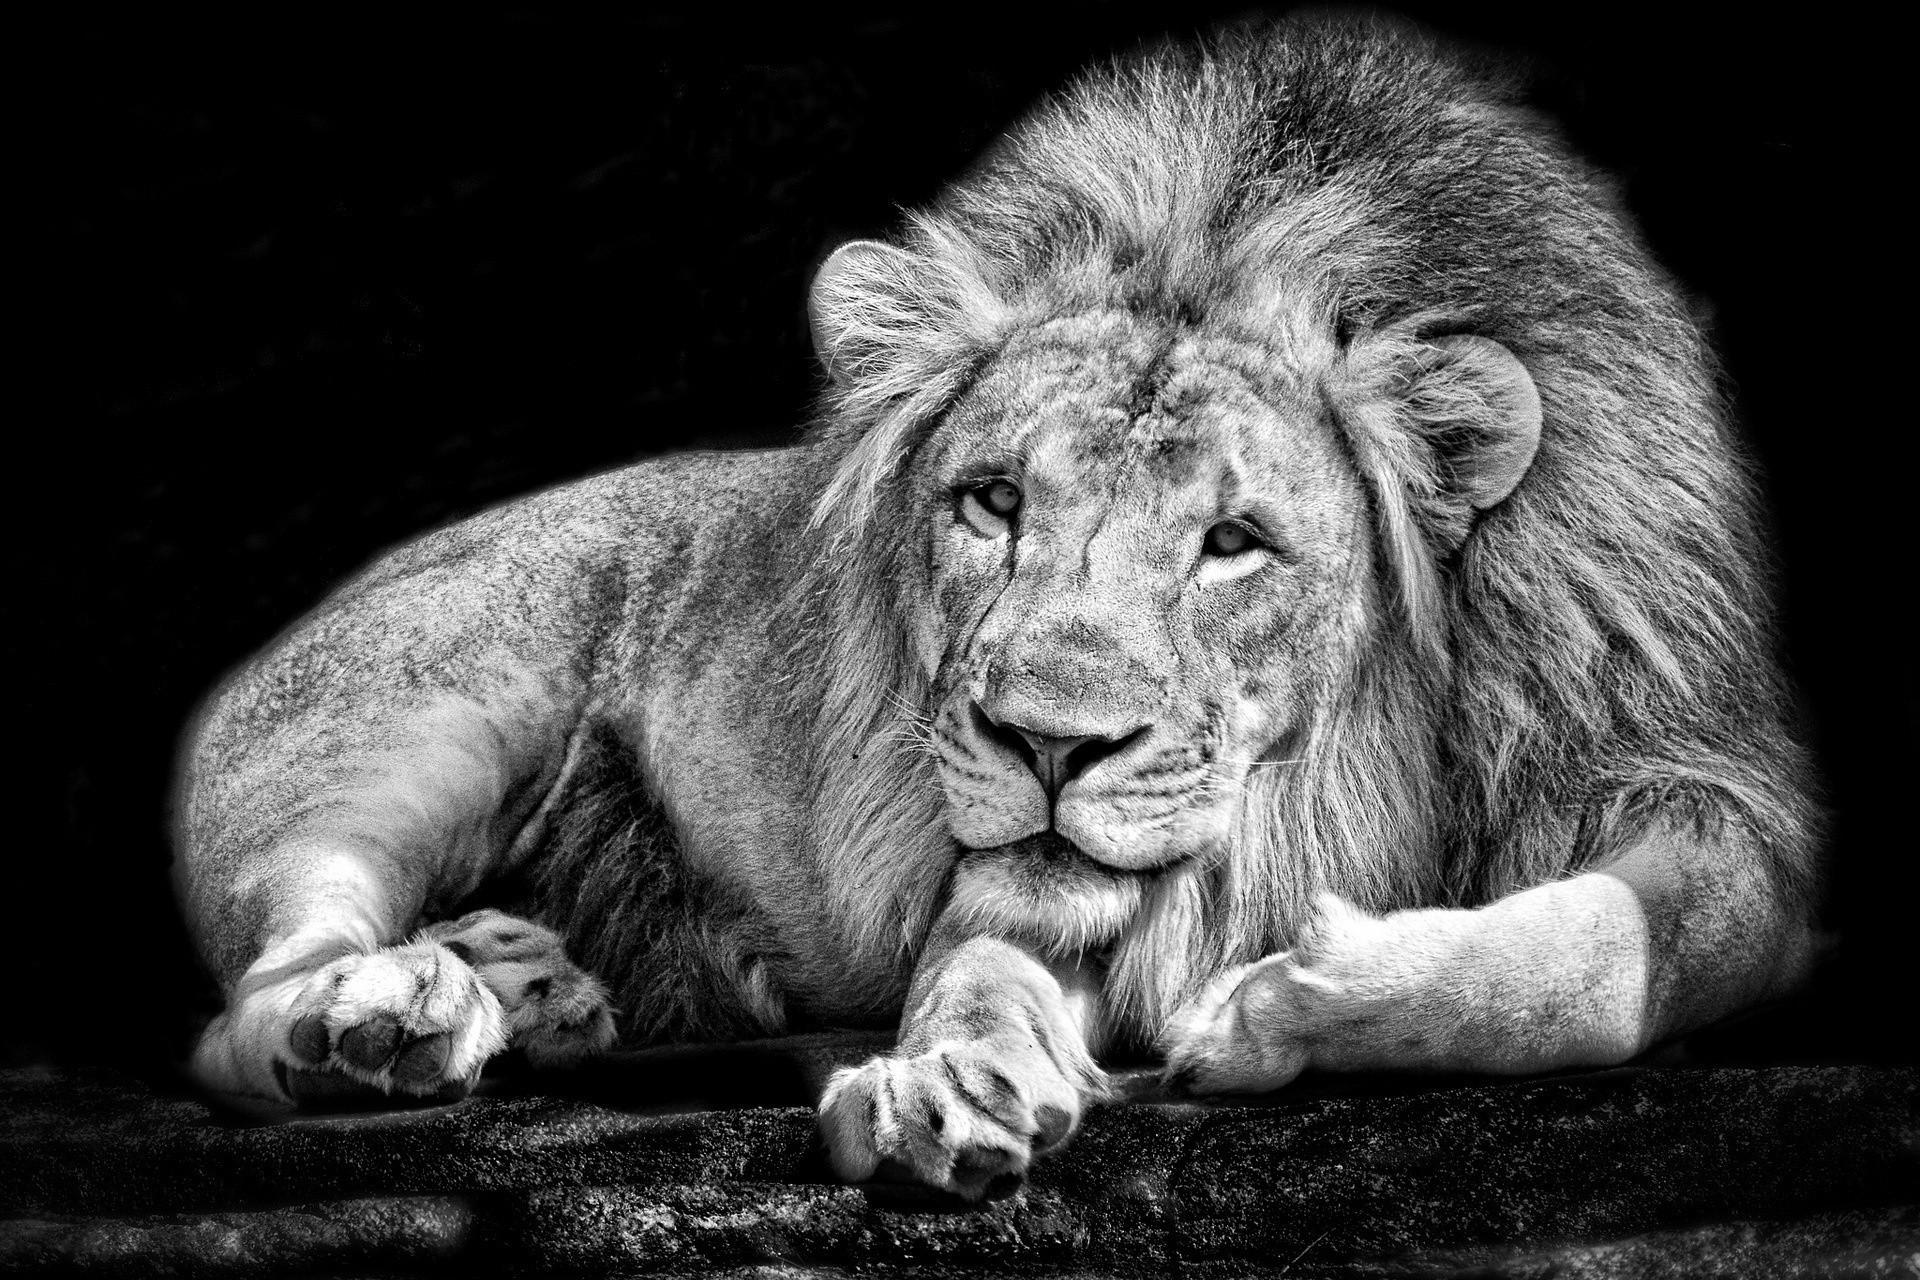 Lion wallpaper black and white hd – photo#27